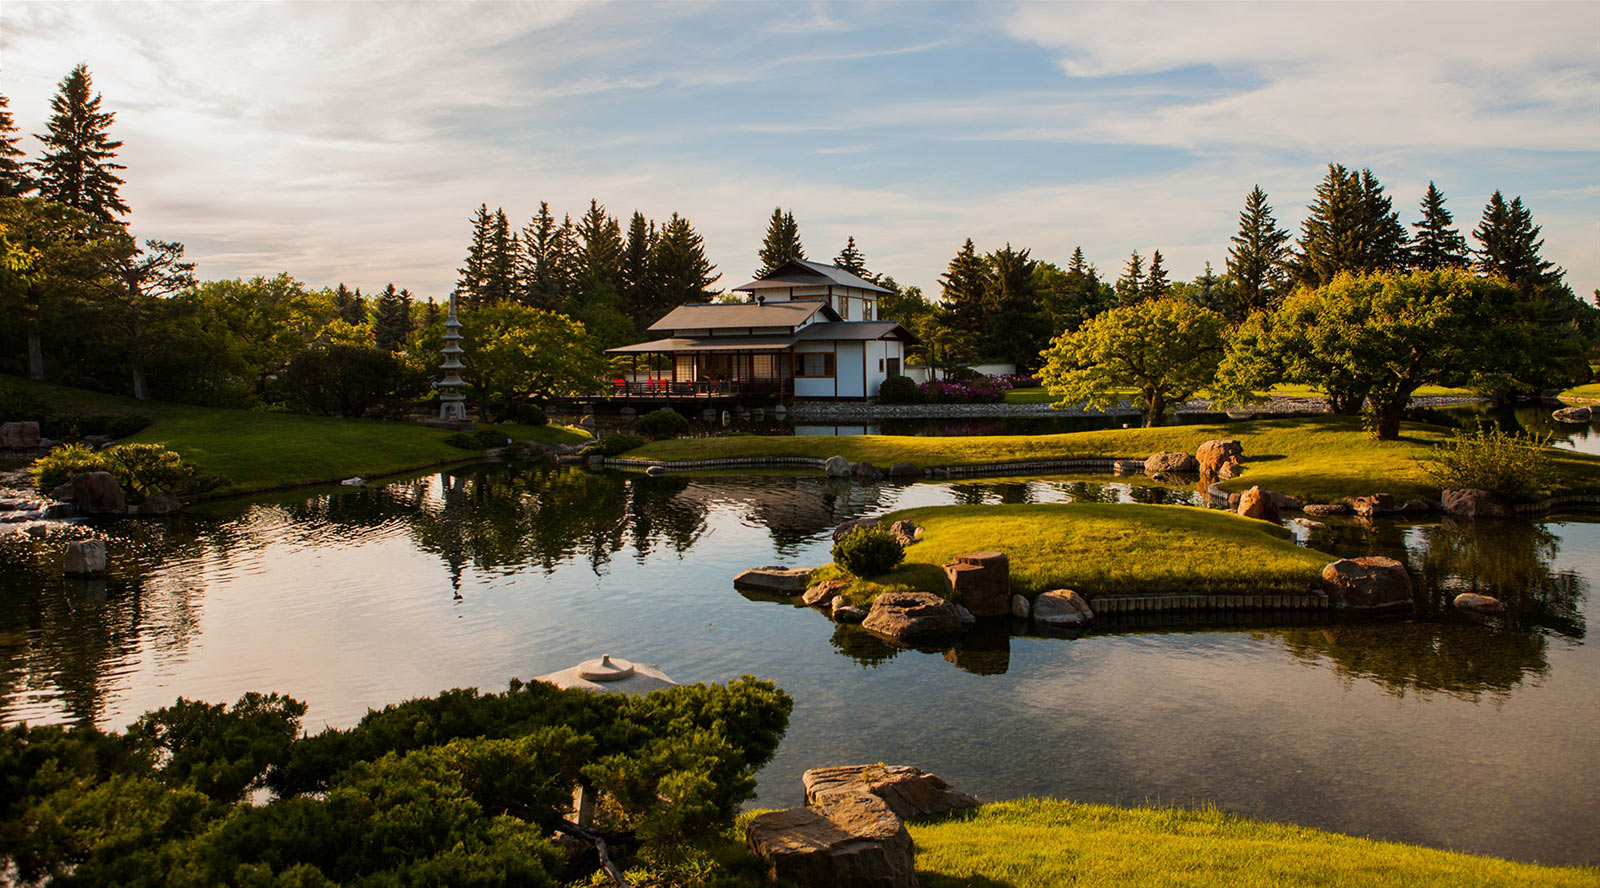 Nikka Yuko Japanese Garden in Lethbridge, Alberta